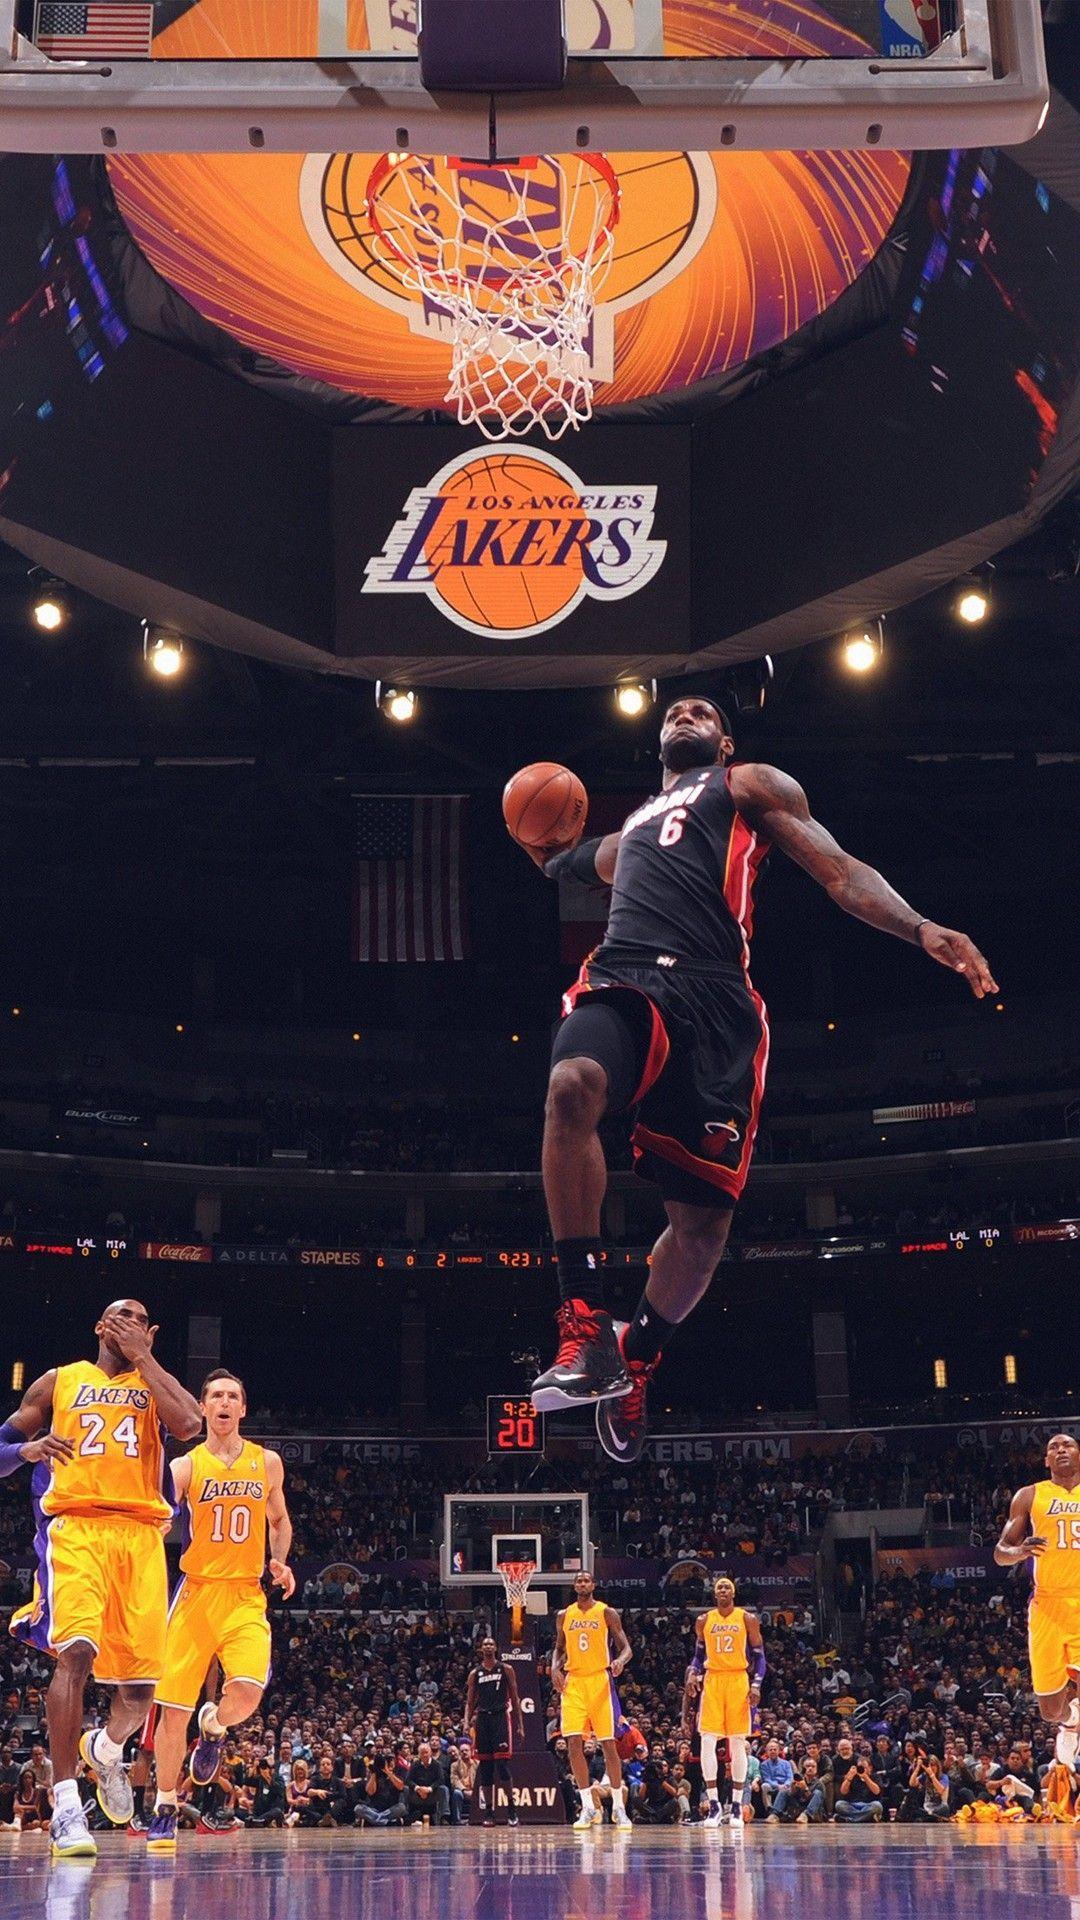 NBA iPhone Wallpapers - Top Free NBA